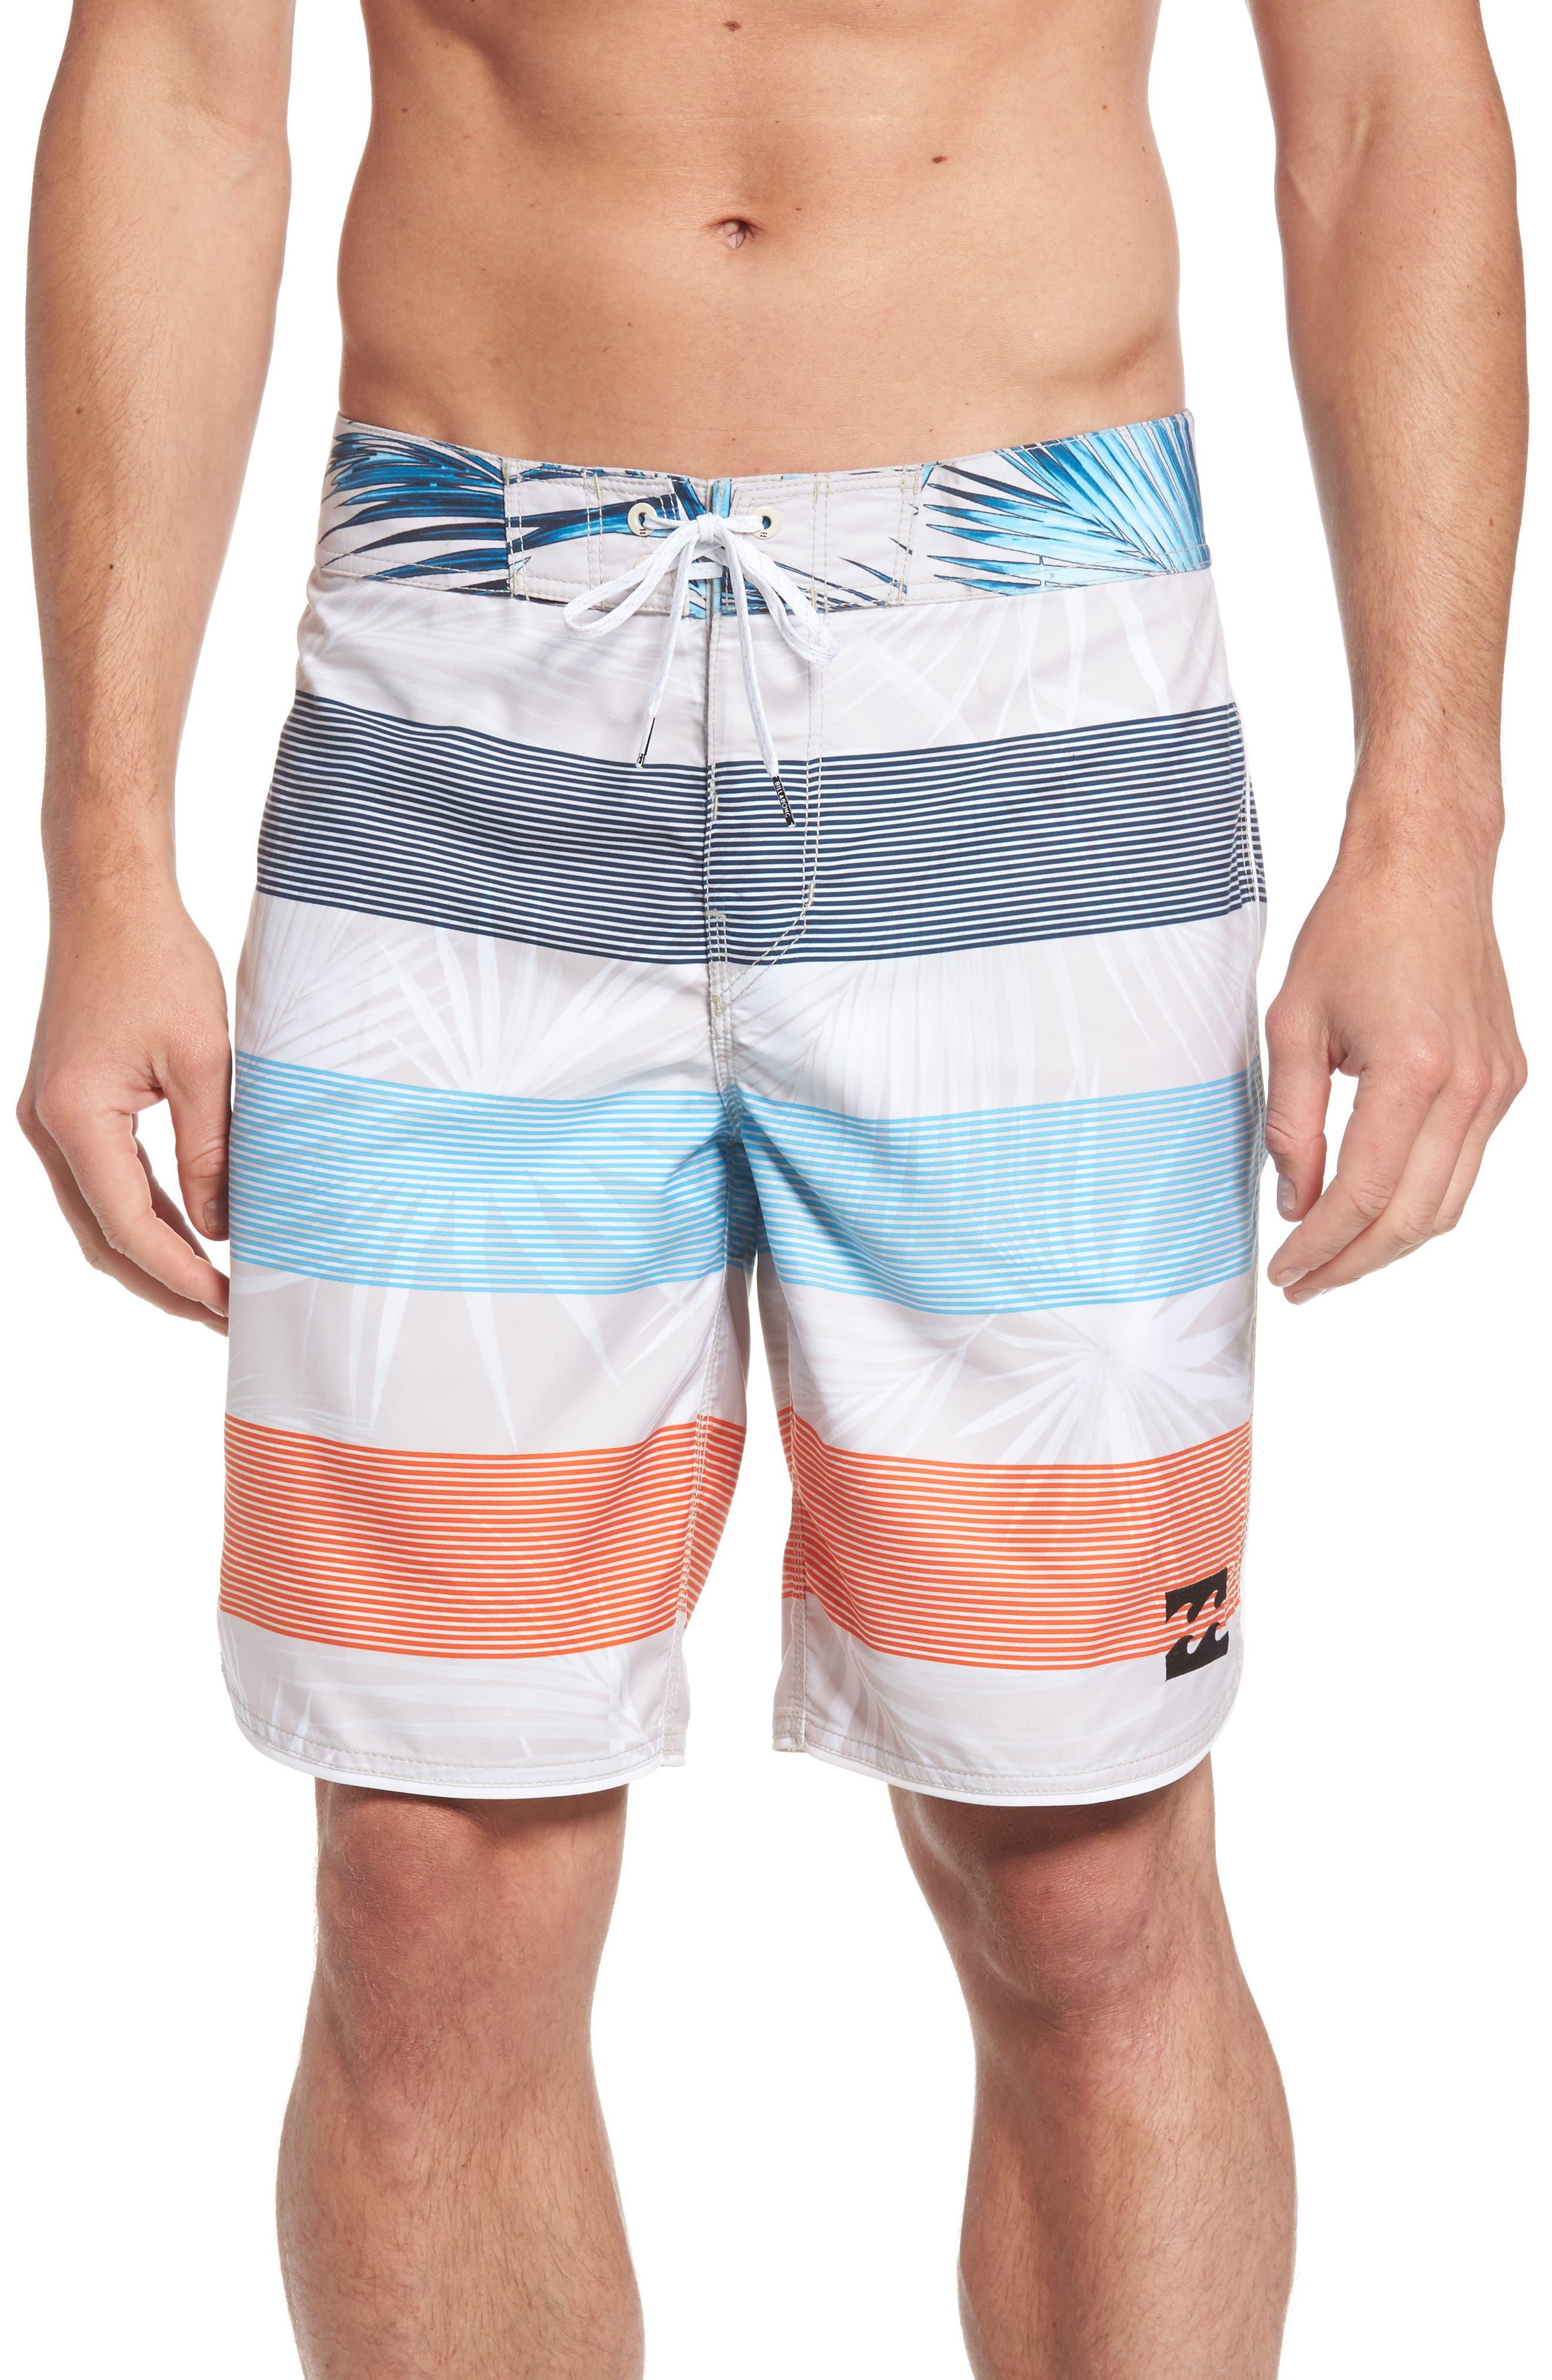 73 OG Stripe Board Shorts,                             Main thumbnail 1, color,                             Stone